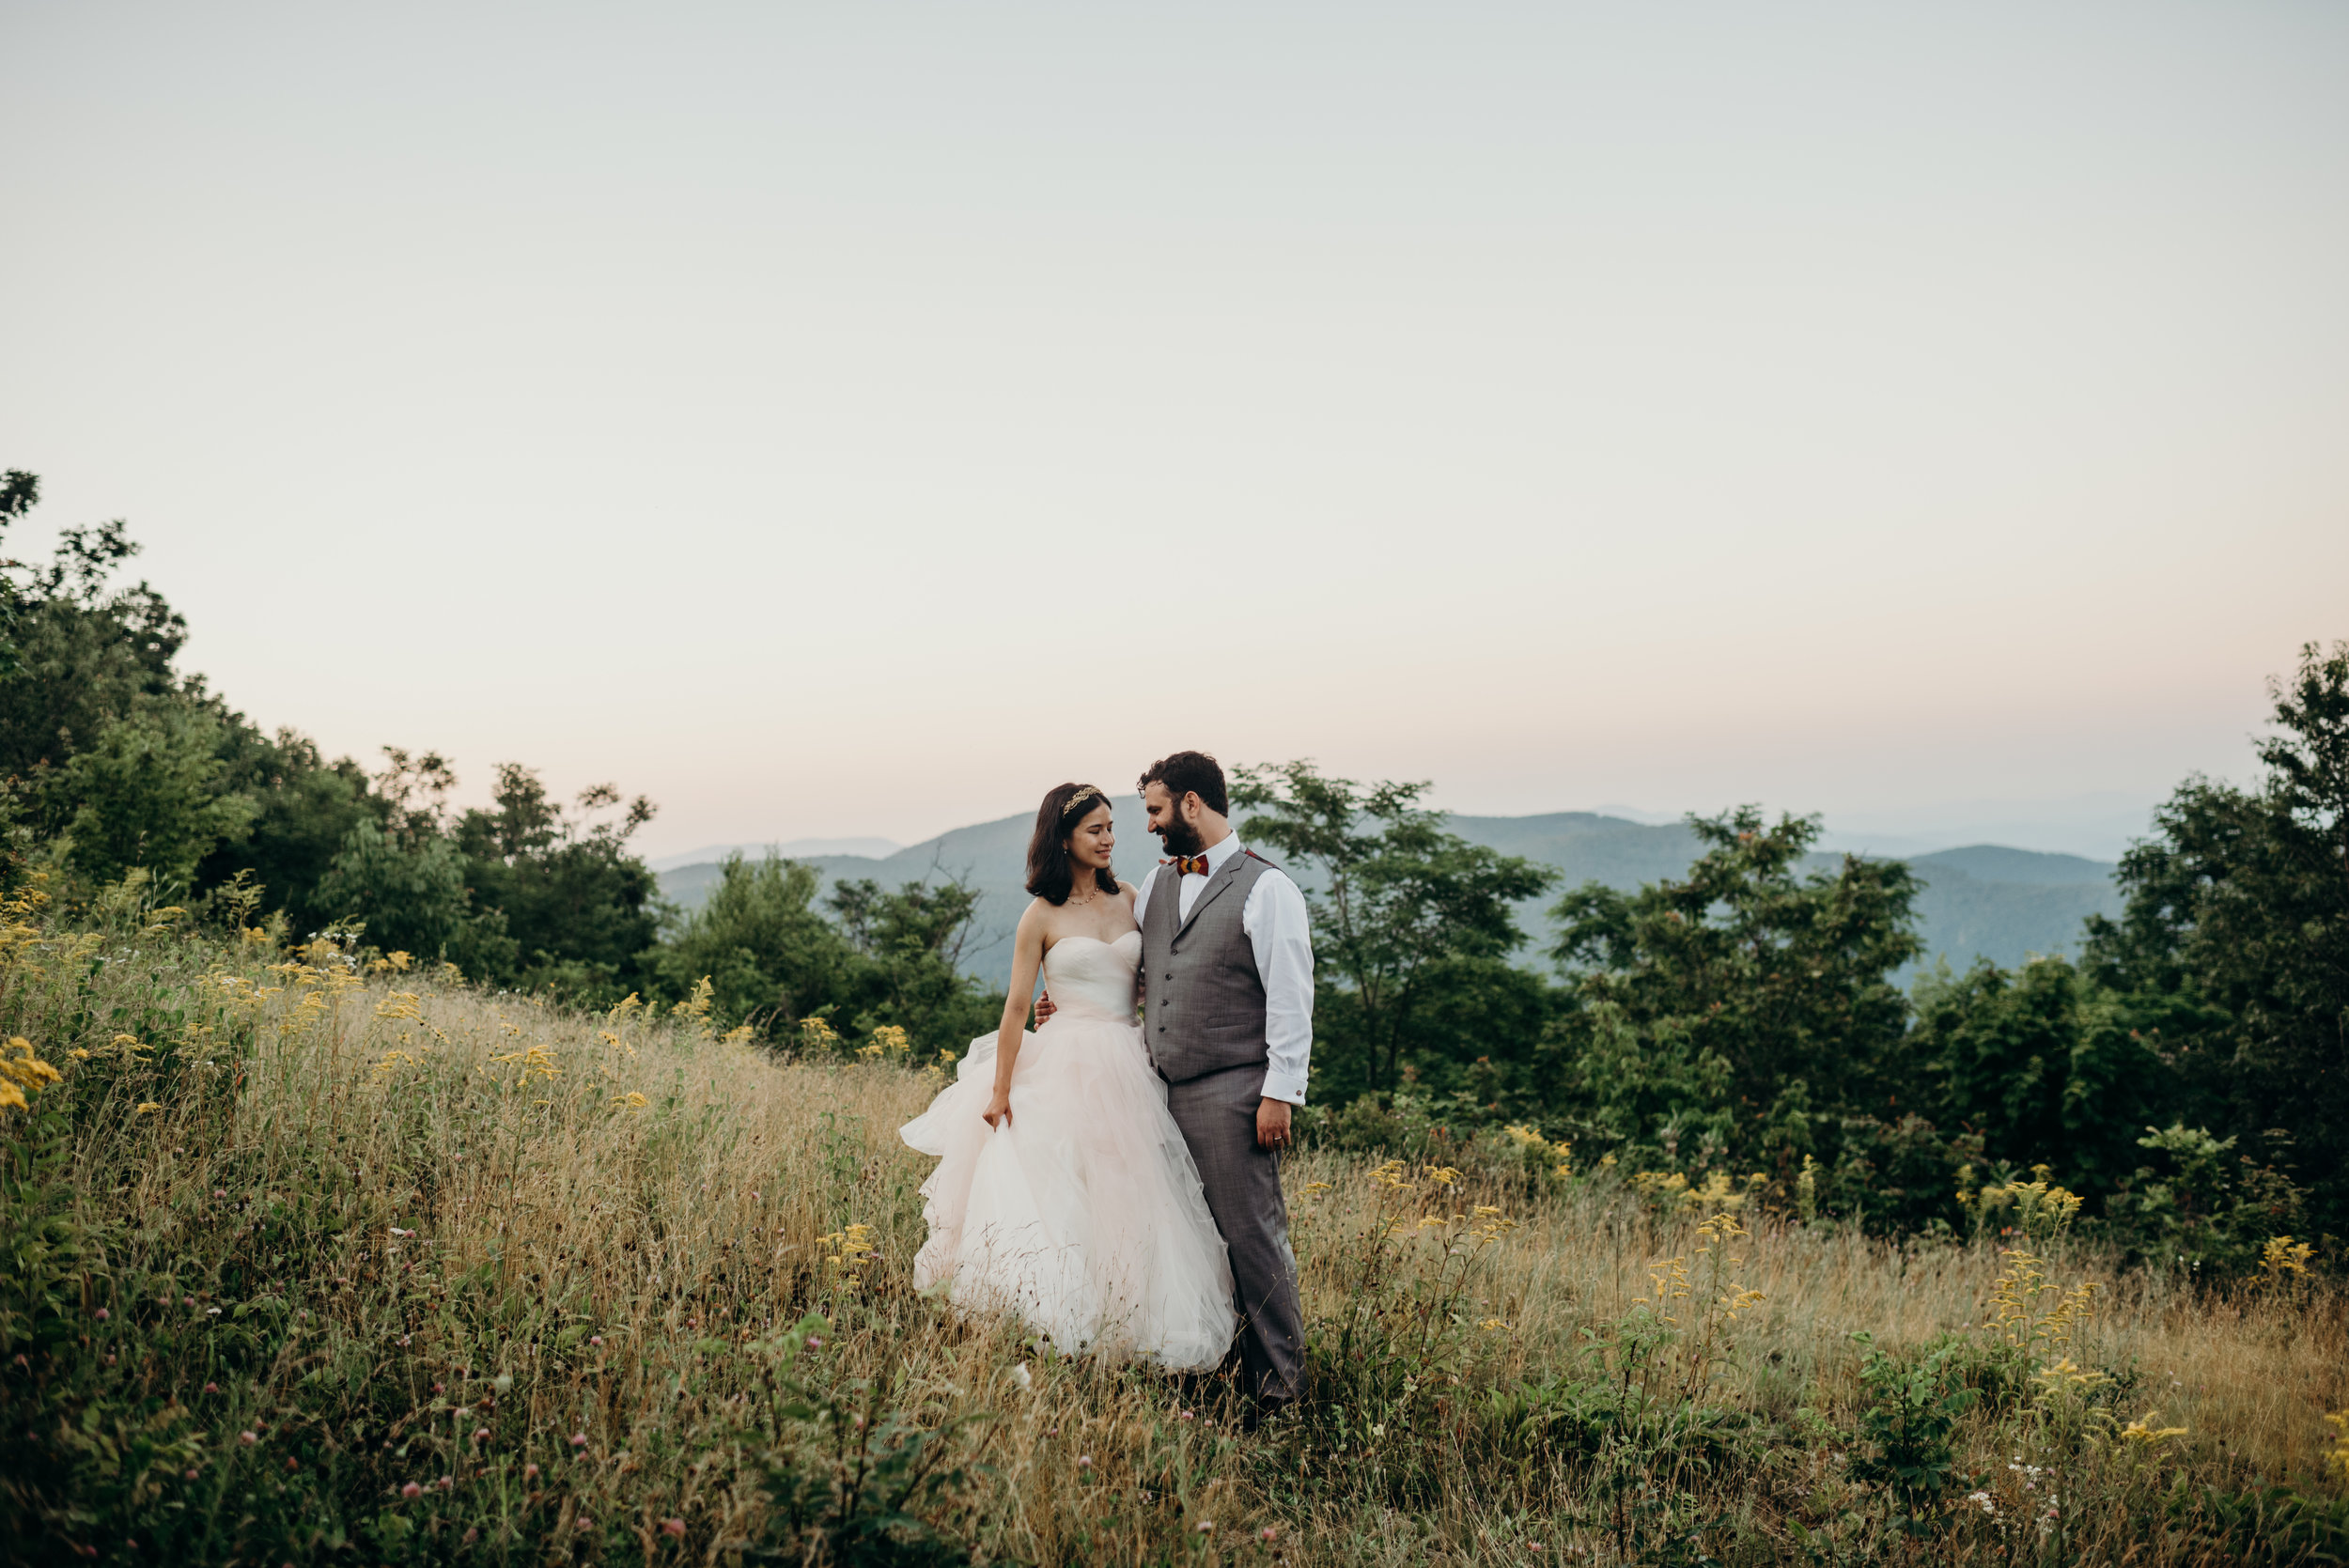 skyland-shenandoah-national-park-elopement-wedding-photographer